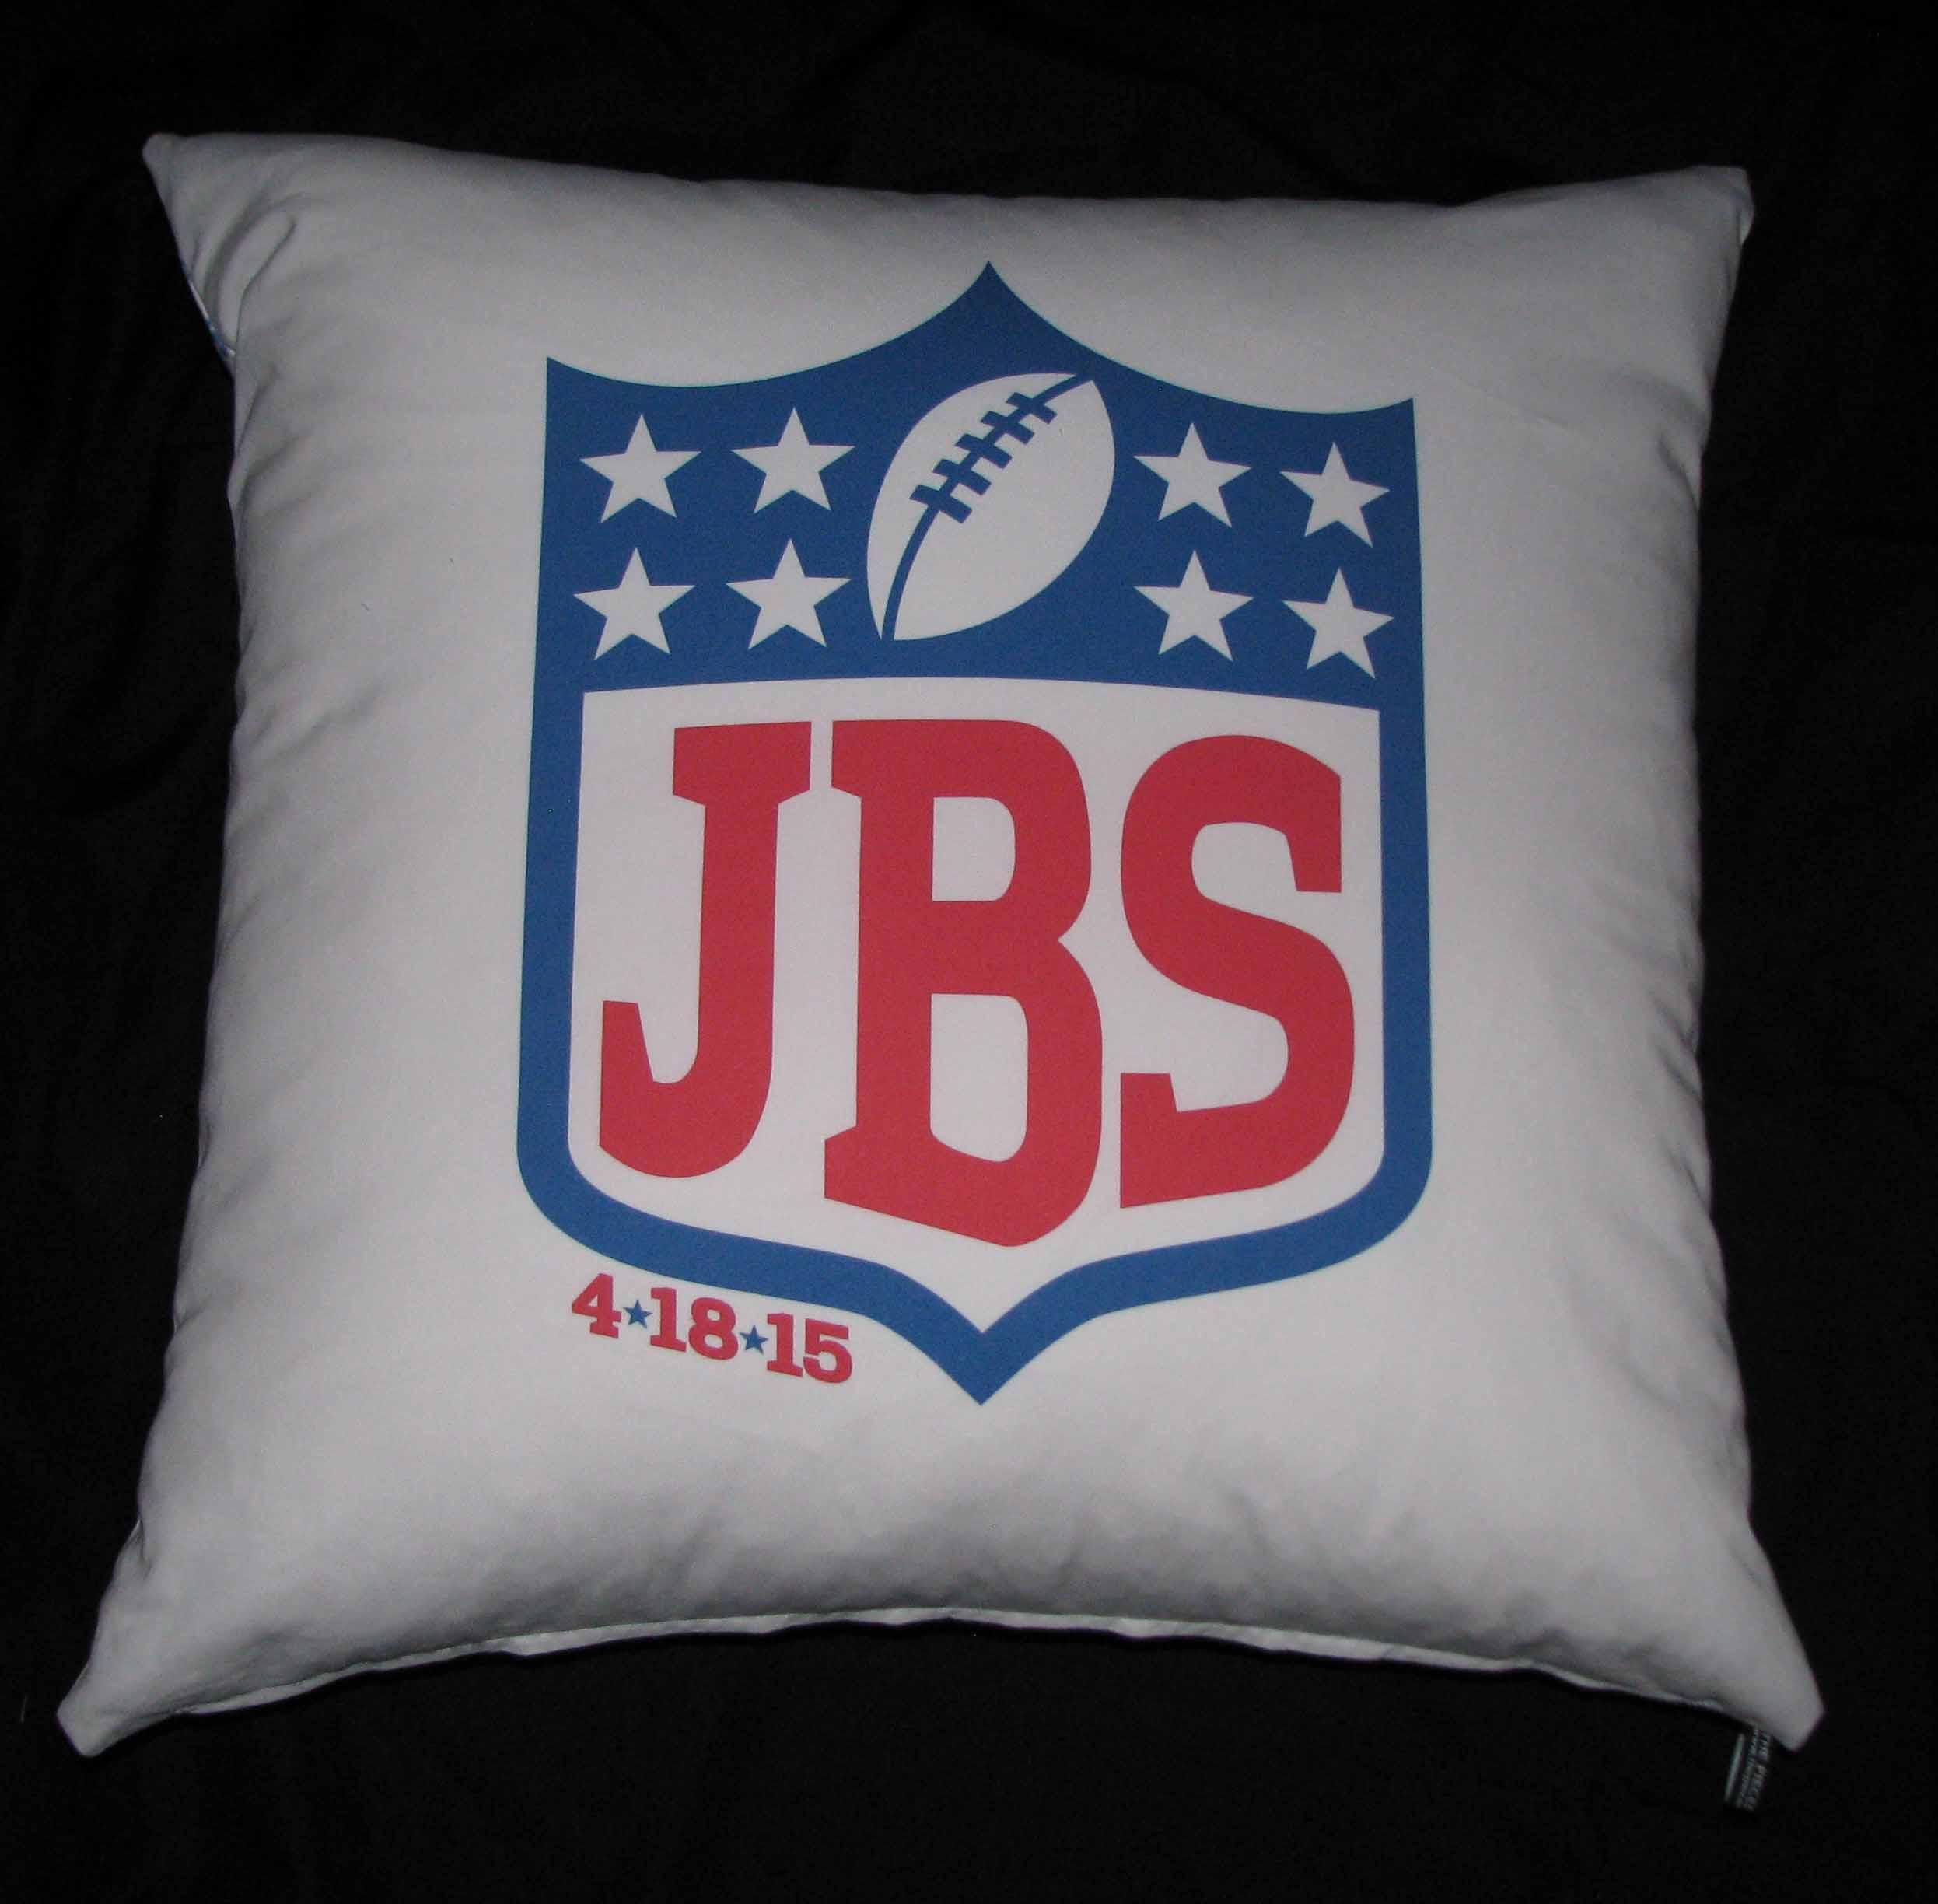 JAKE'S NFL PILLOW